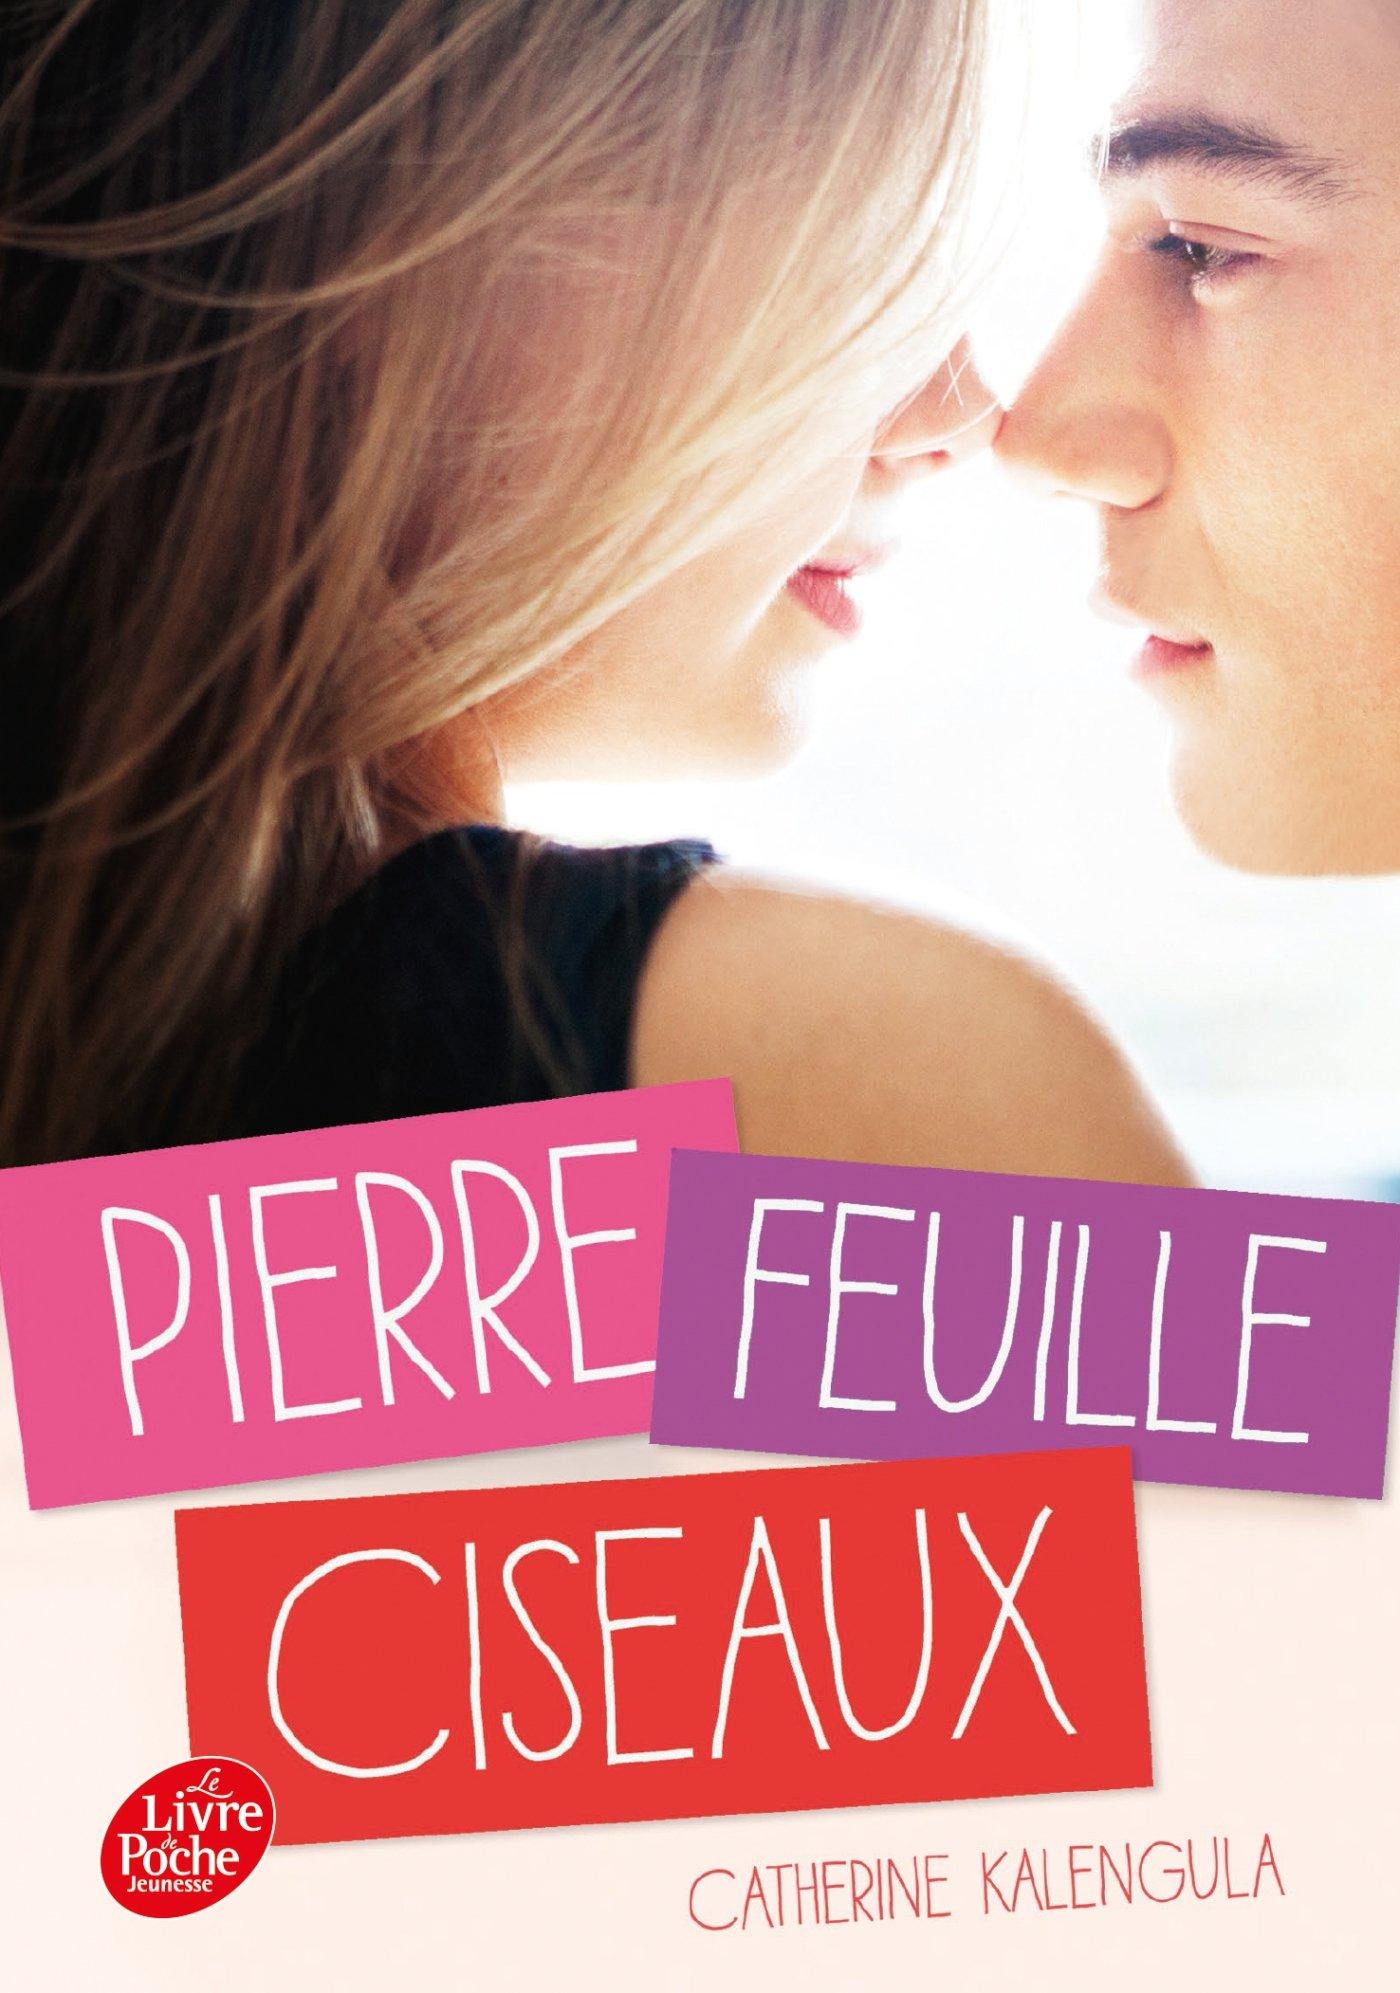 Pierre Feuille Ciseaux Catherine Kalengula 9782011611628